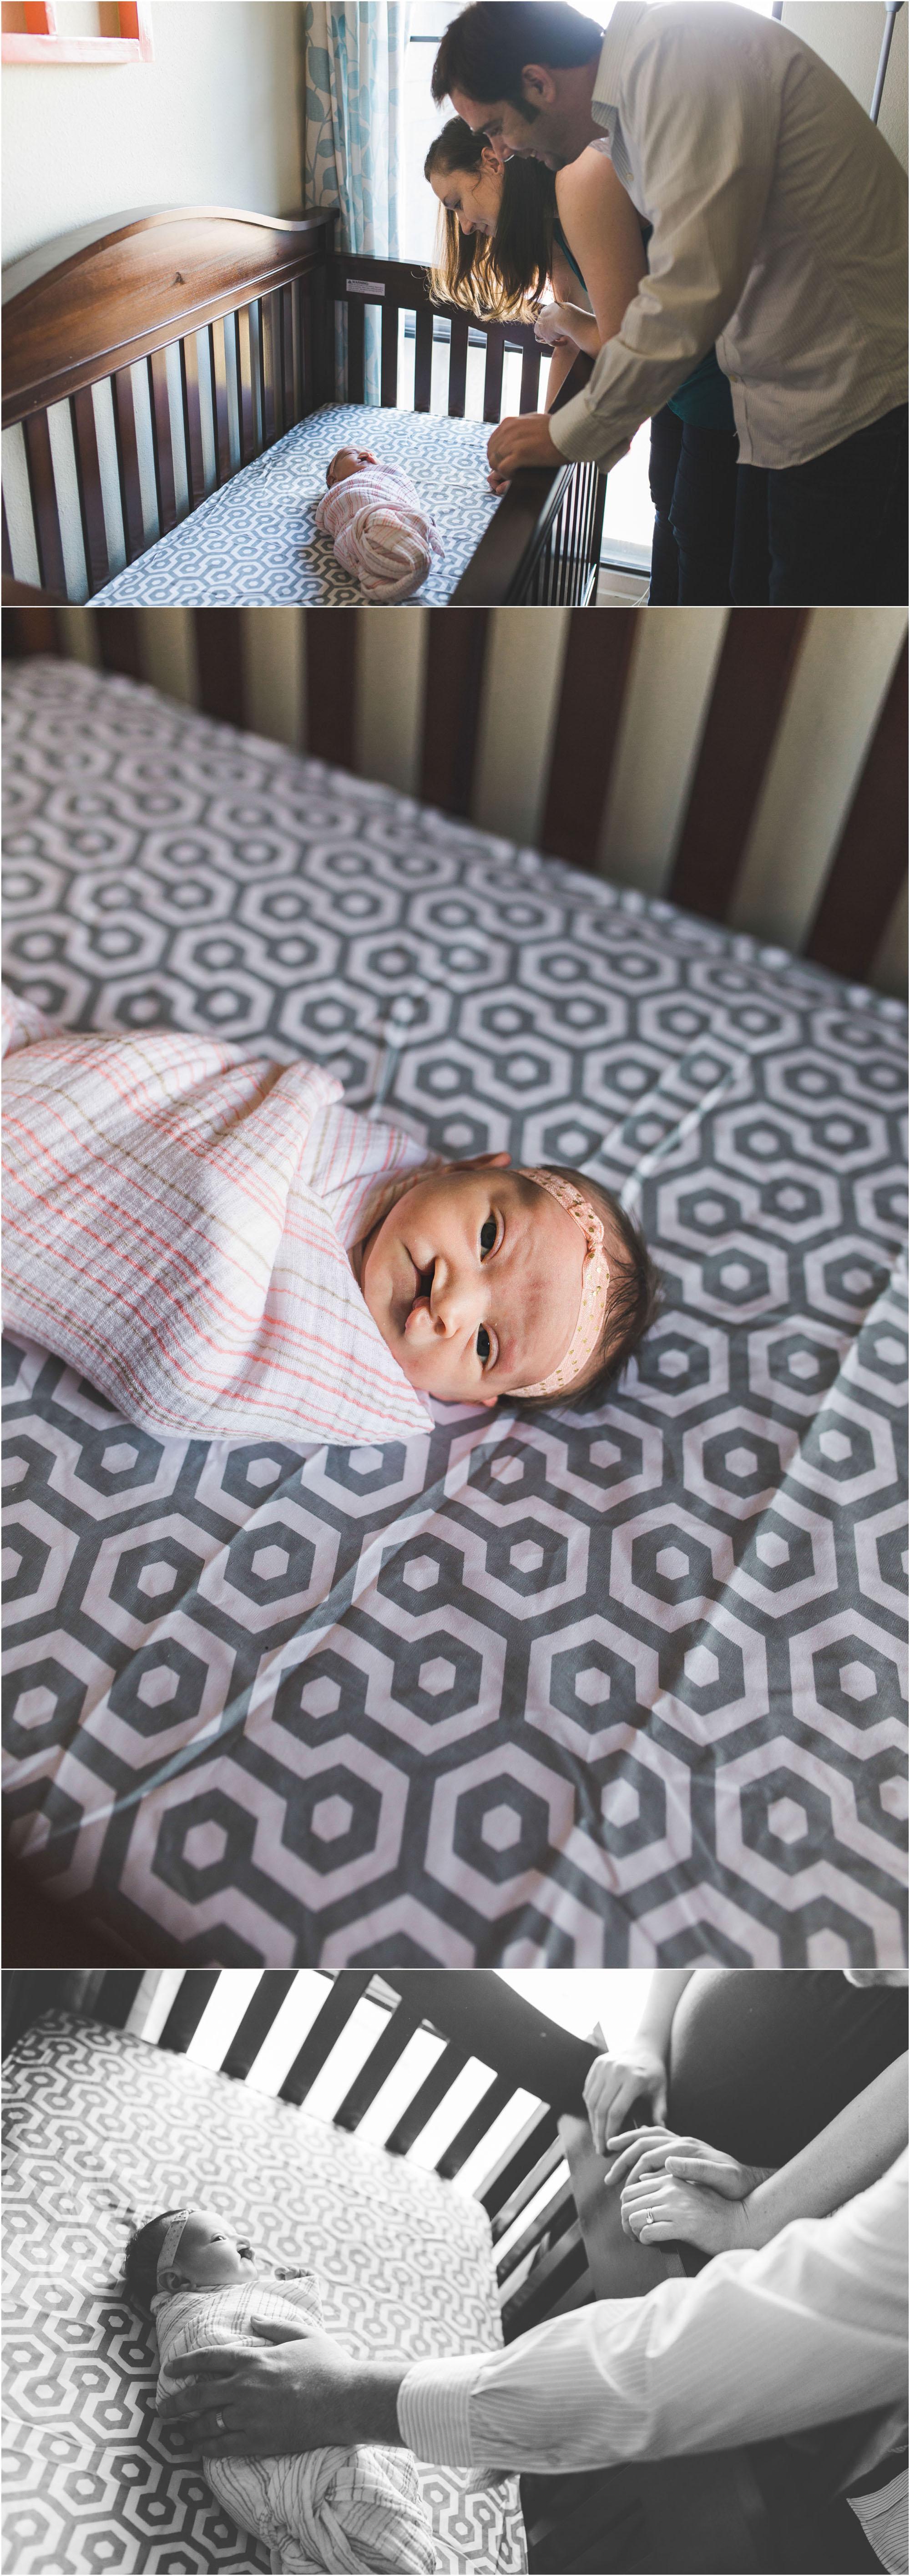 ashley vos photography seattle newborn photographer_0020.jpg